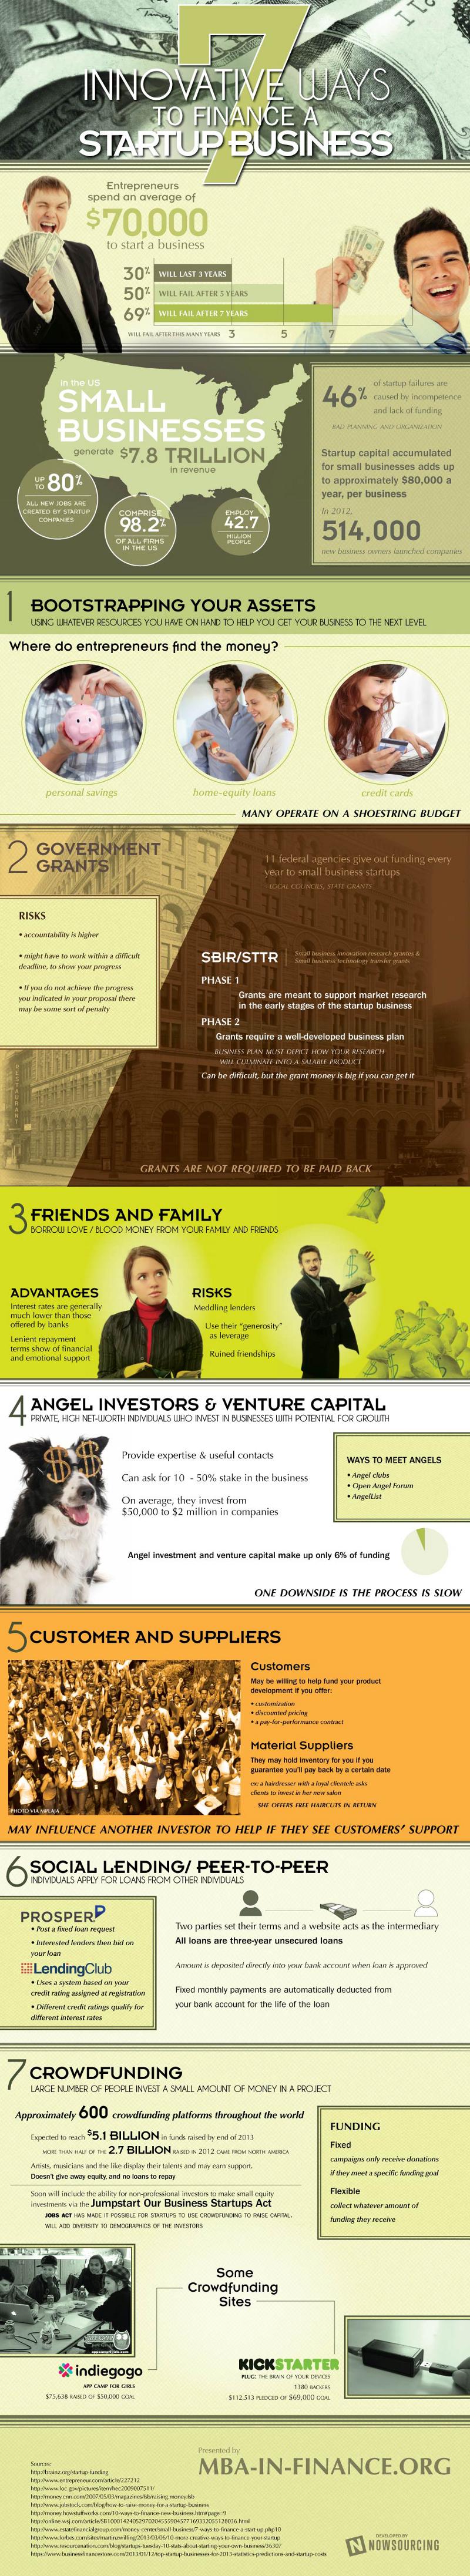 Startup-Financing-Strategies